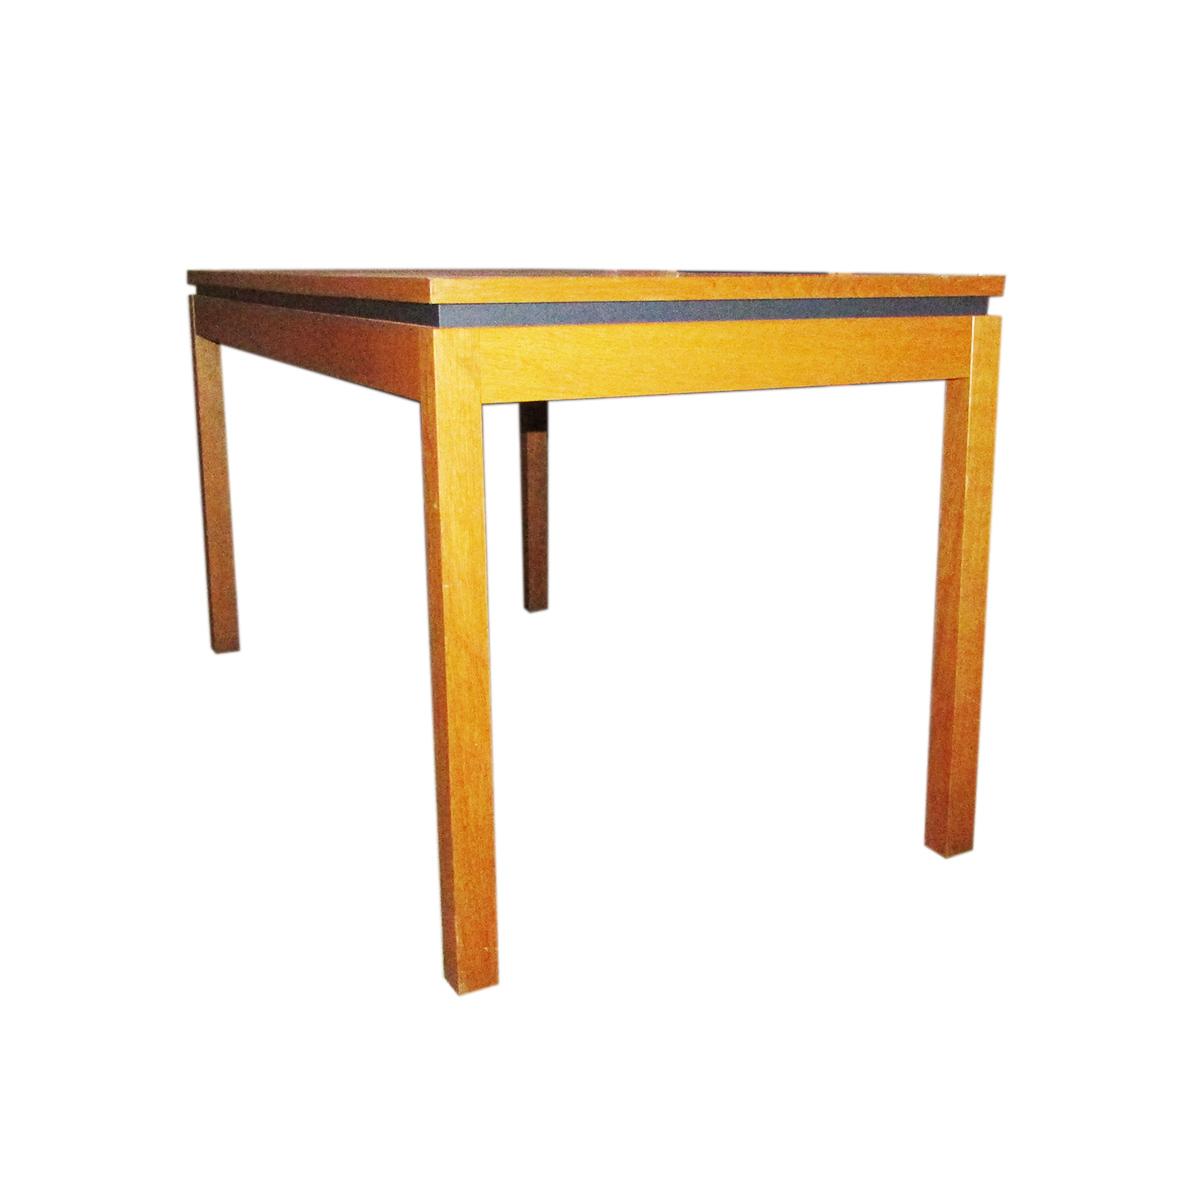 Horgen glarus dining table artichoke vintage furniture for 1 1 table